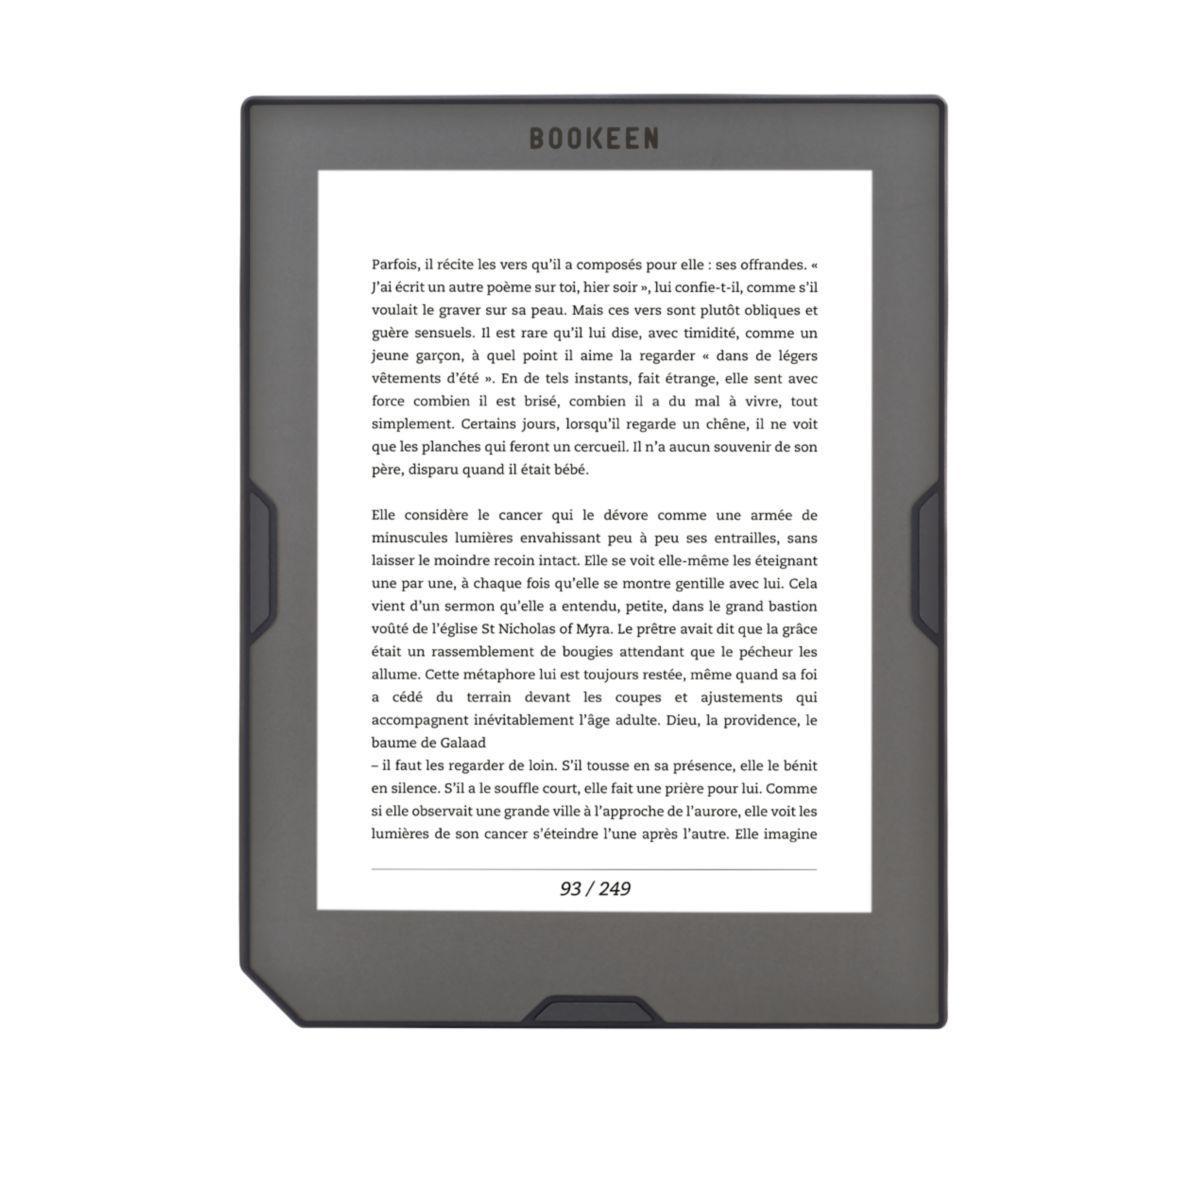 E-book bookeen cybook muse hd - 2% de remise immédiate avec le code : cool2 (photo)